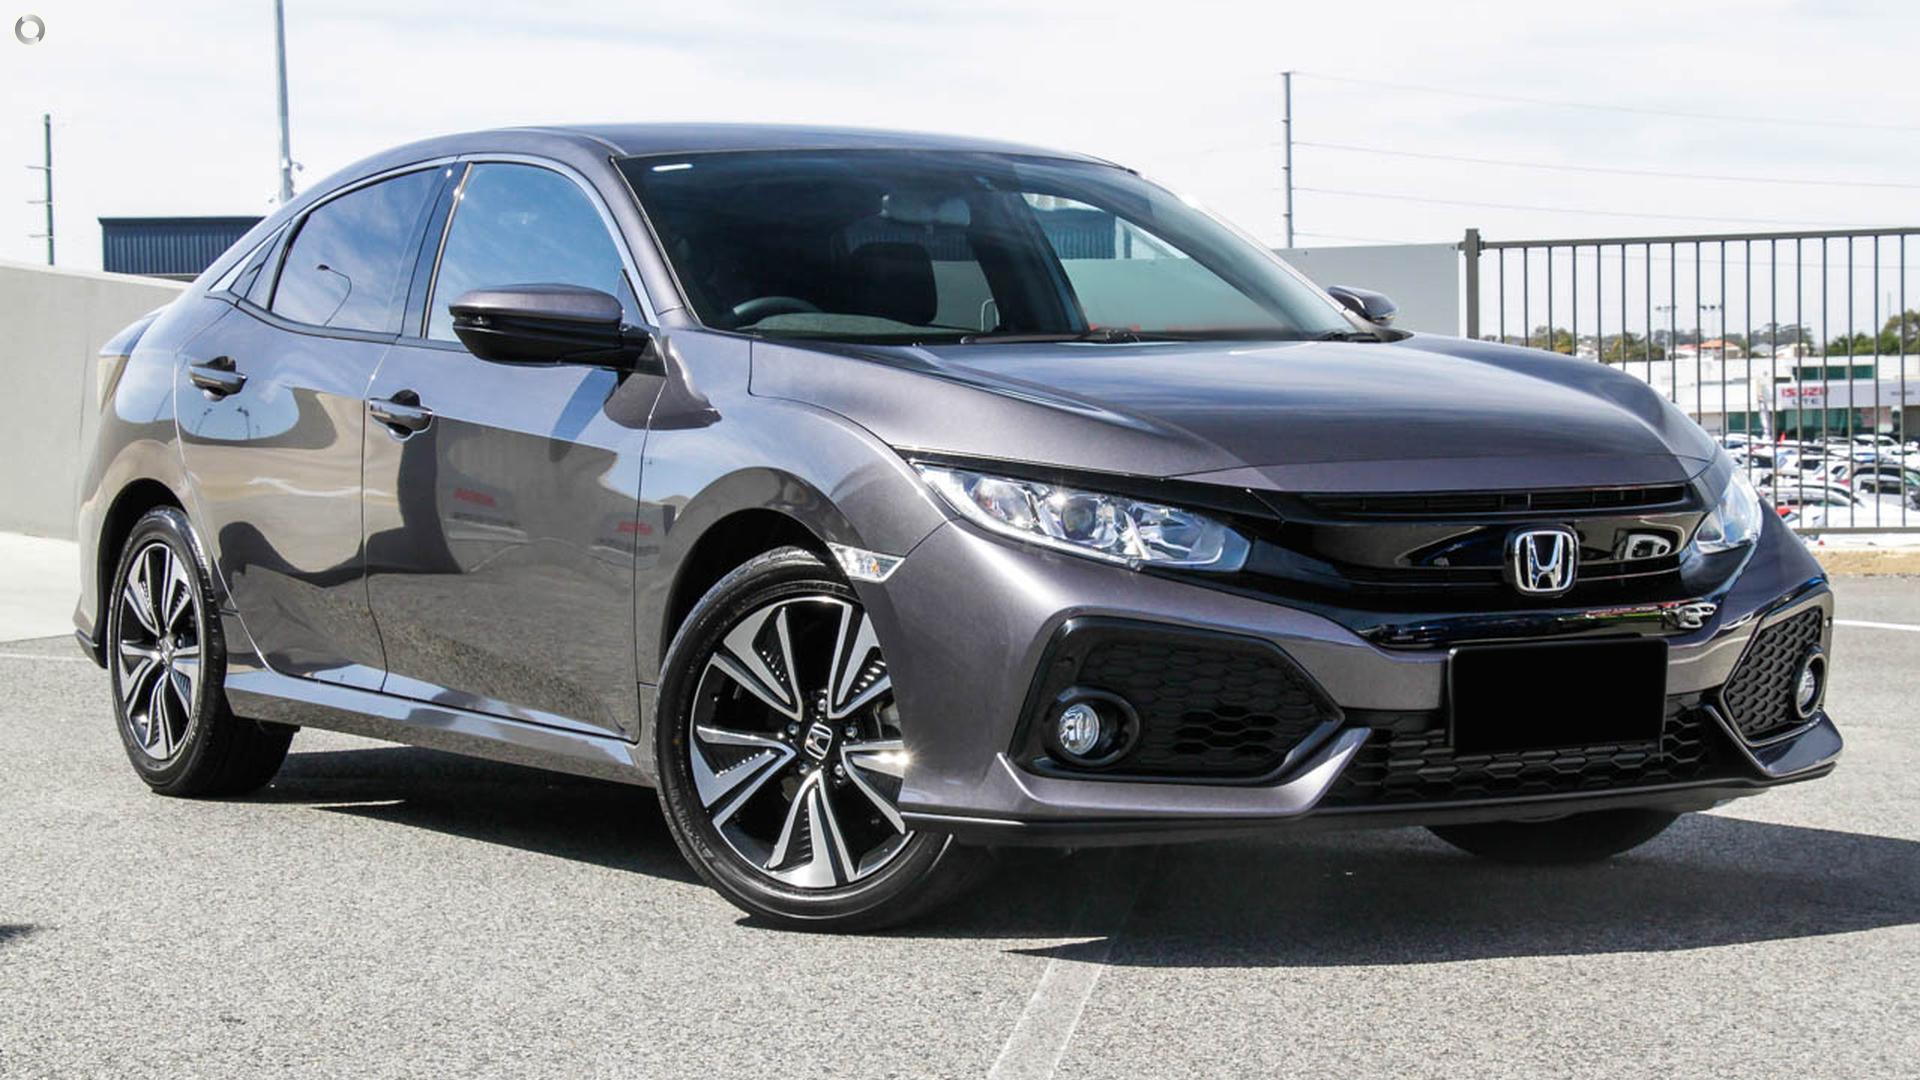 2018 Honda Civic VTi-L 10th Gen